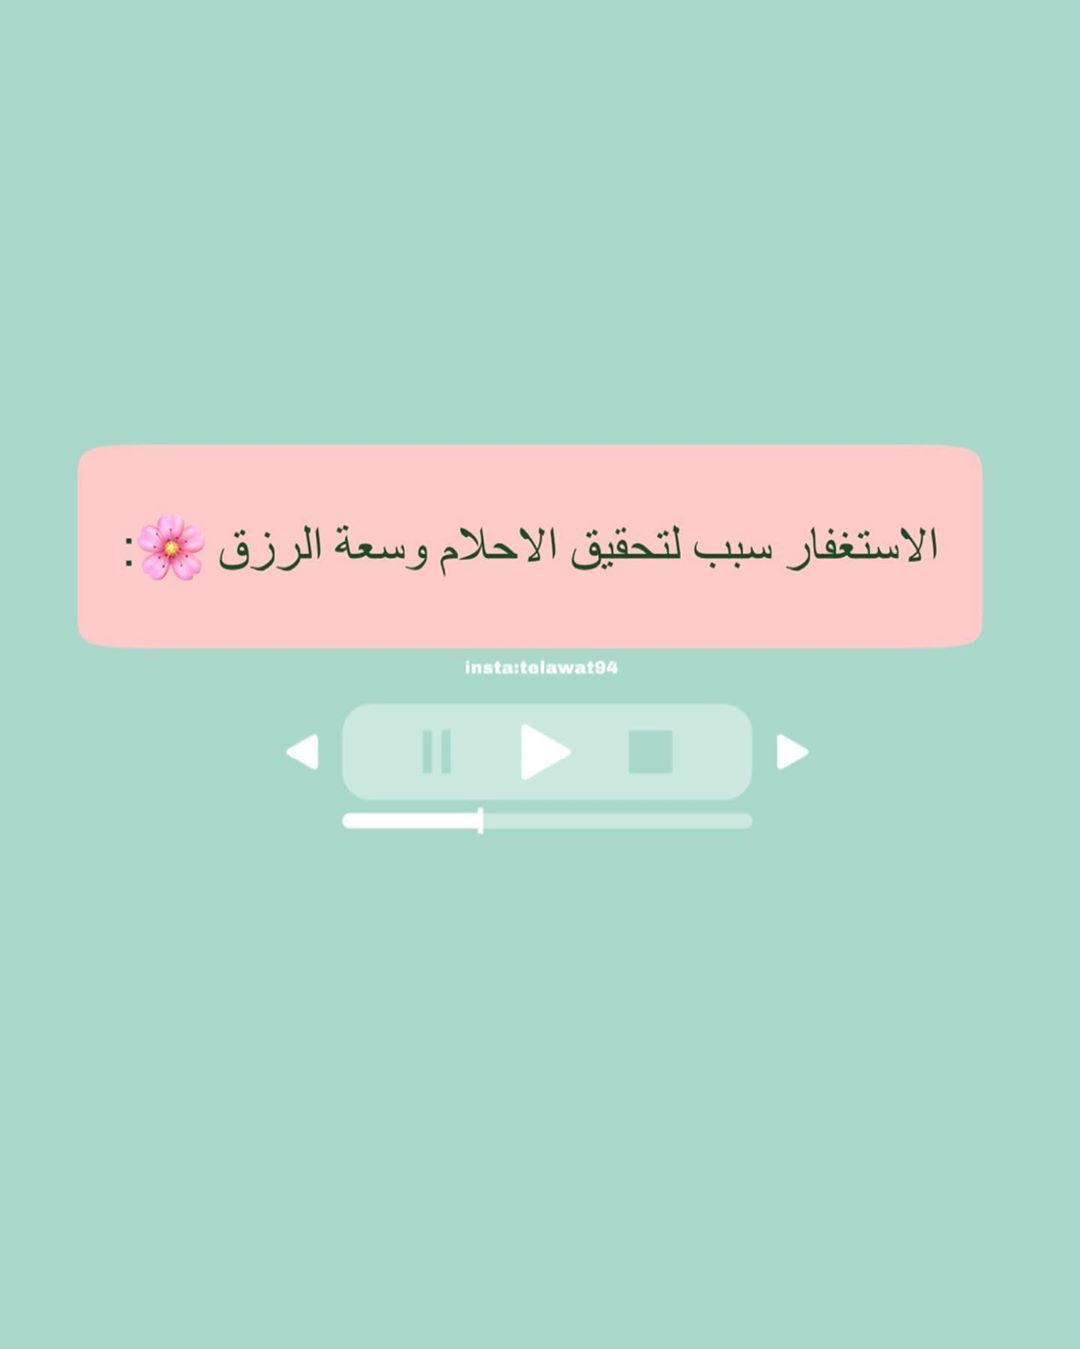 1 788 Likes 95 Comments لله ح ديث قلب ي م لهمة Telawat94 On Instagram اكتب شيء تؤجر عليه Instagram Quotes Captions Jokes Quotes Funny Arabic Quotes